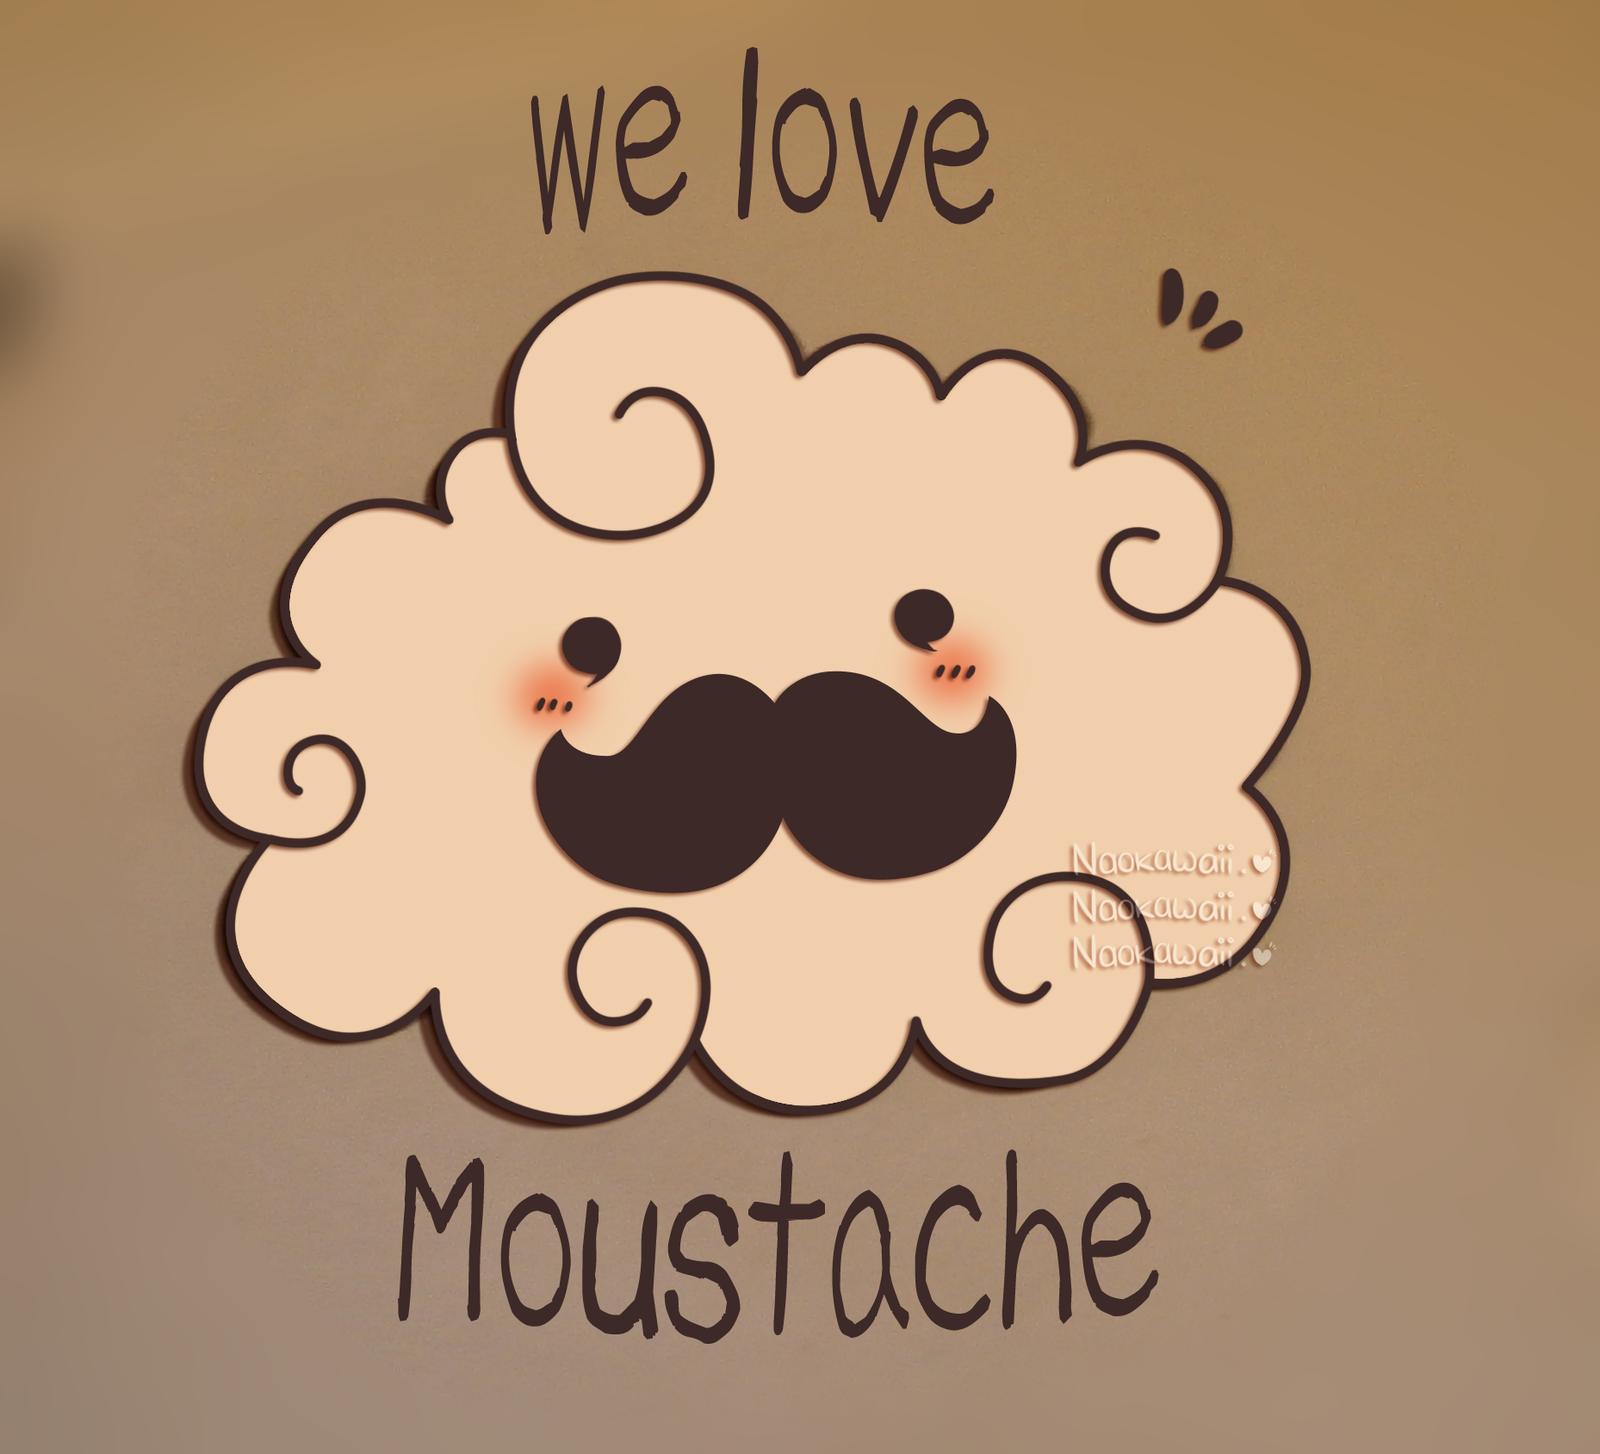 Cute Wallpapers Tumblr Mustache Moustache Cloud By Naokawaii 1600x1454